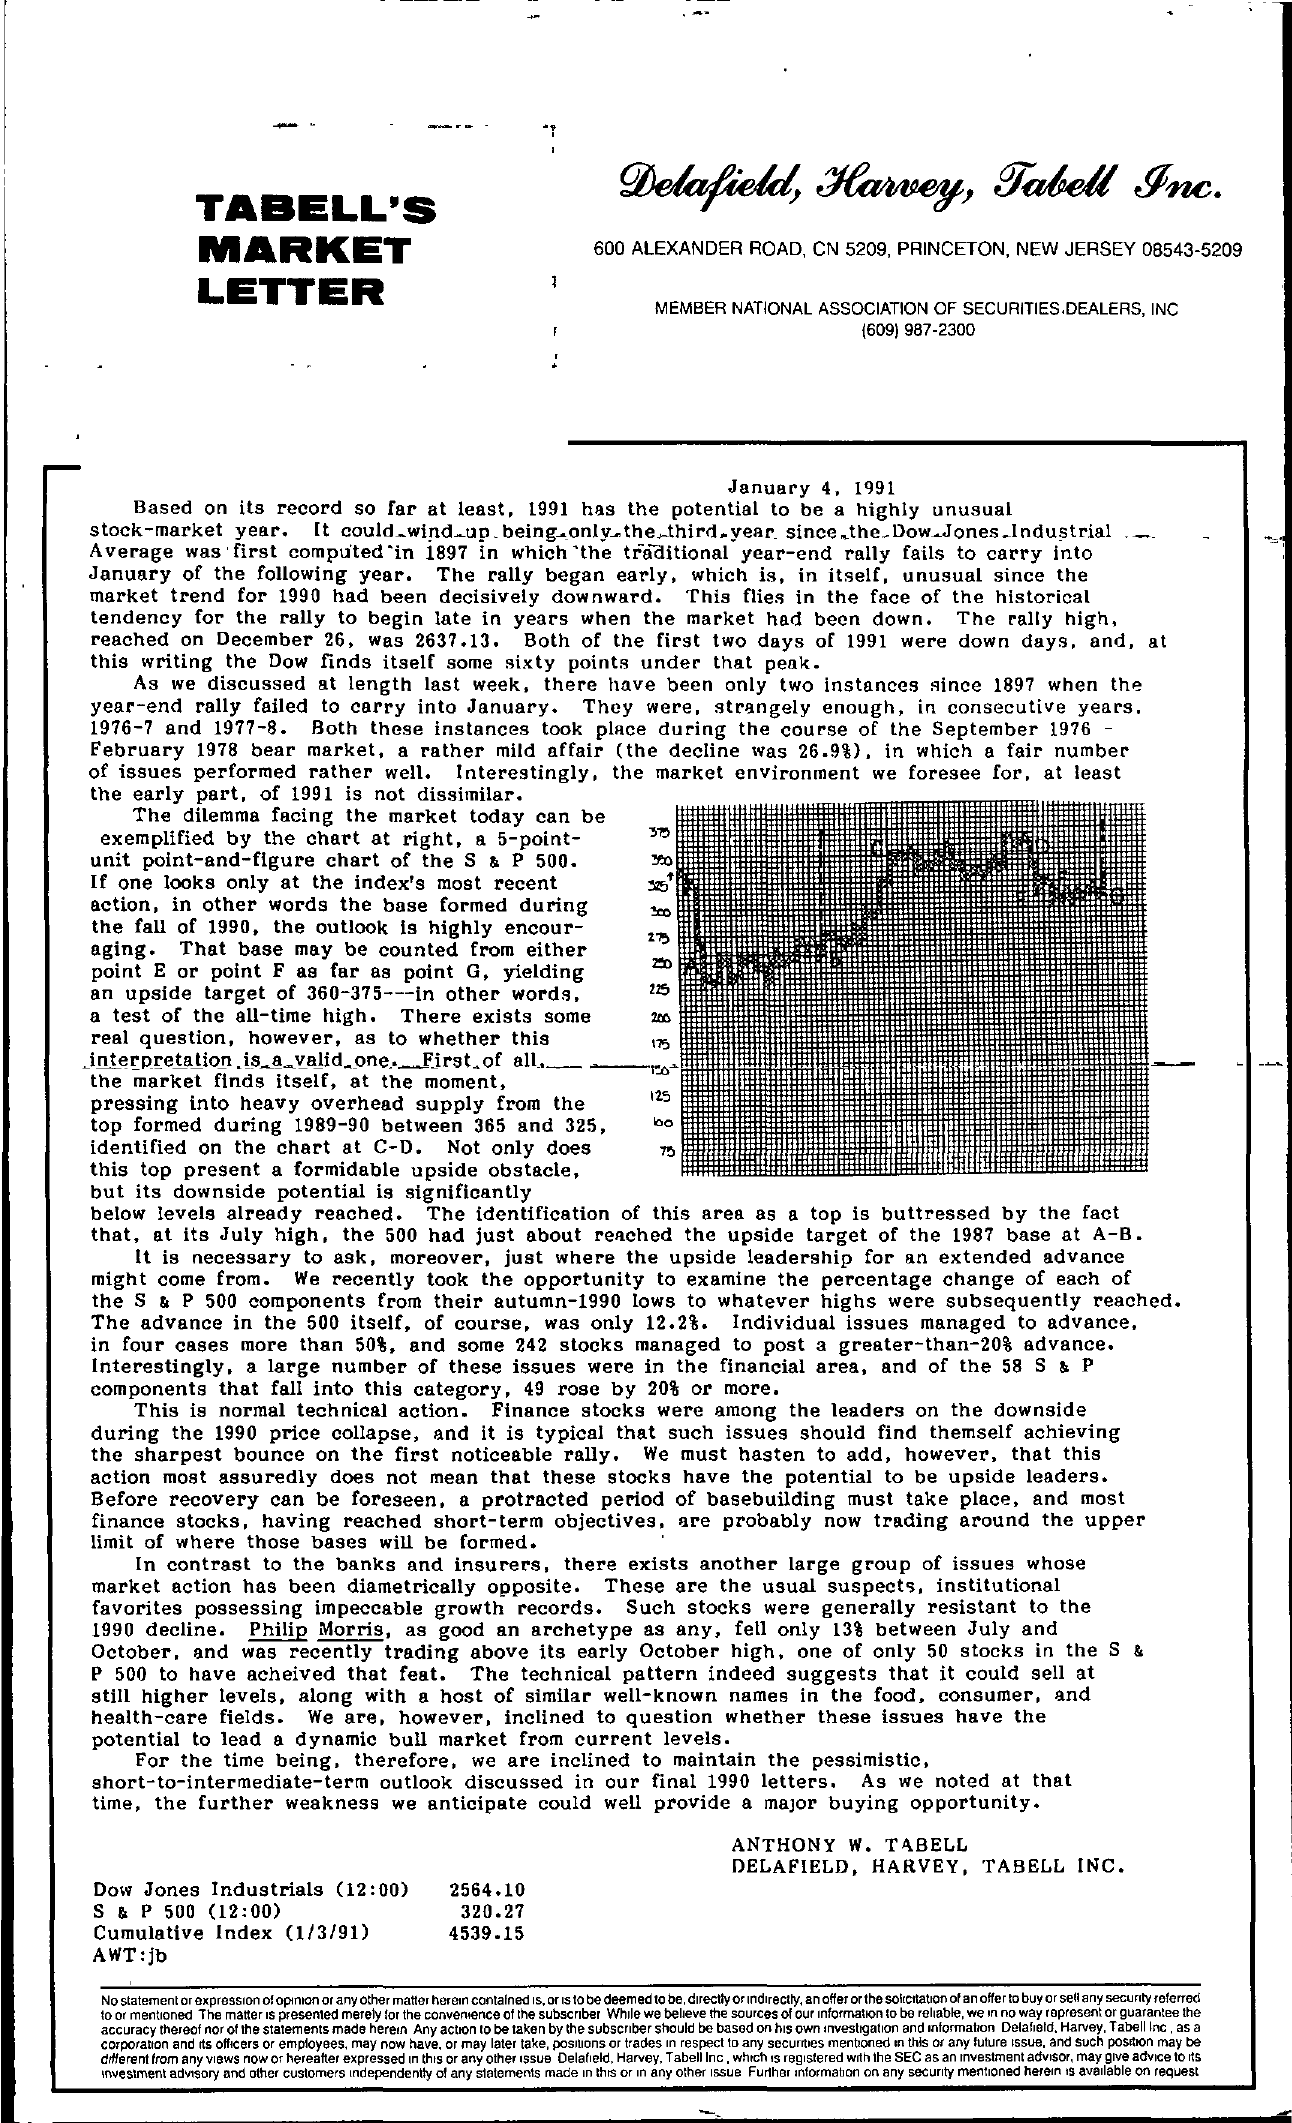 Tabell's Market Letter - January 04, 1991